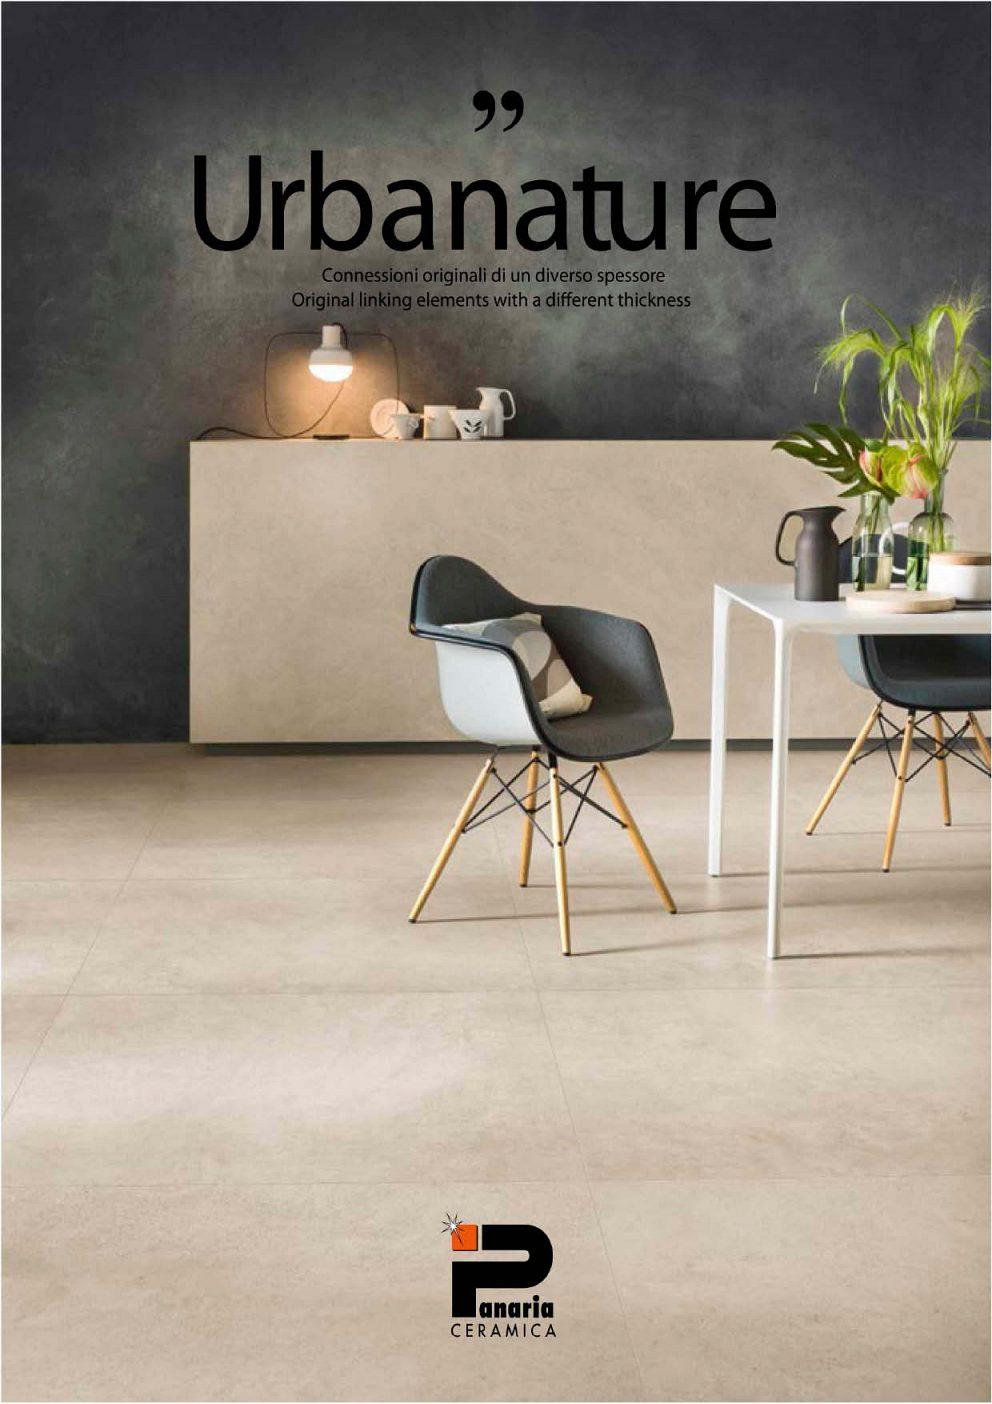 Panaria - Urbanature